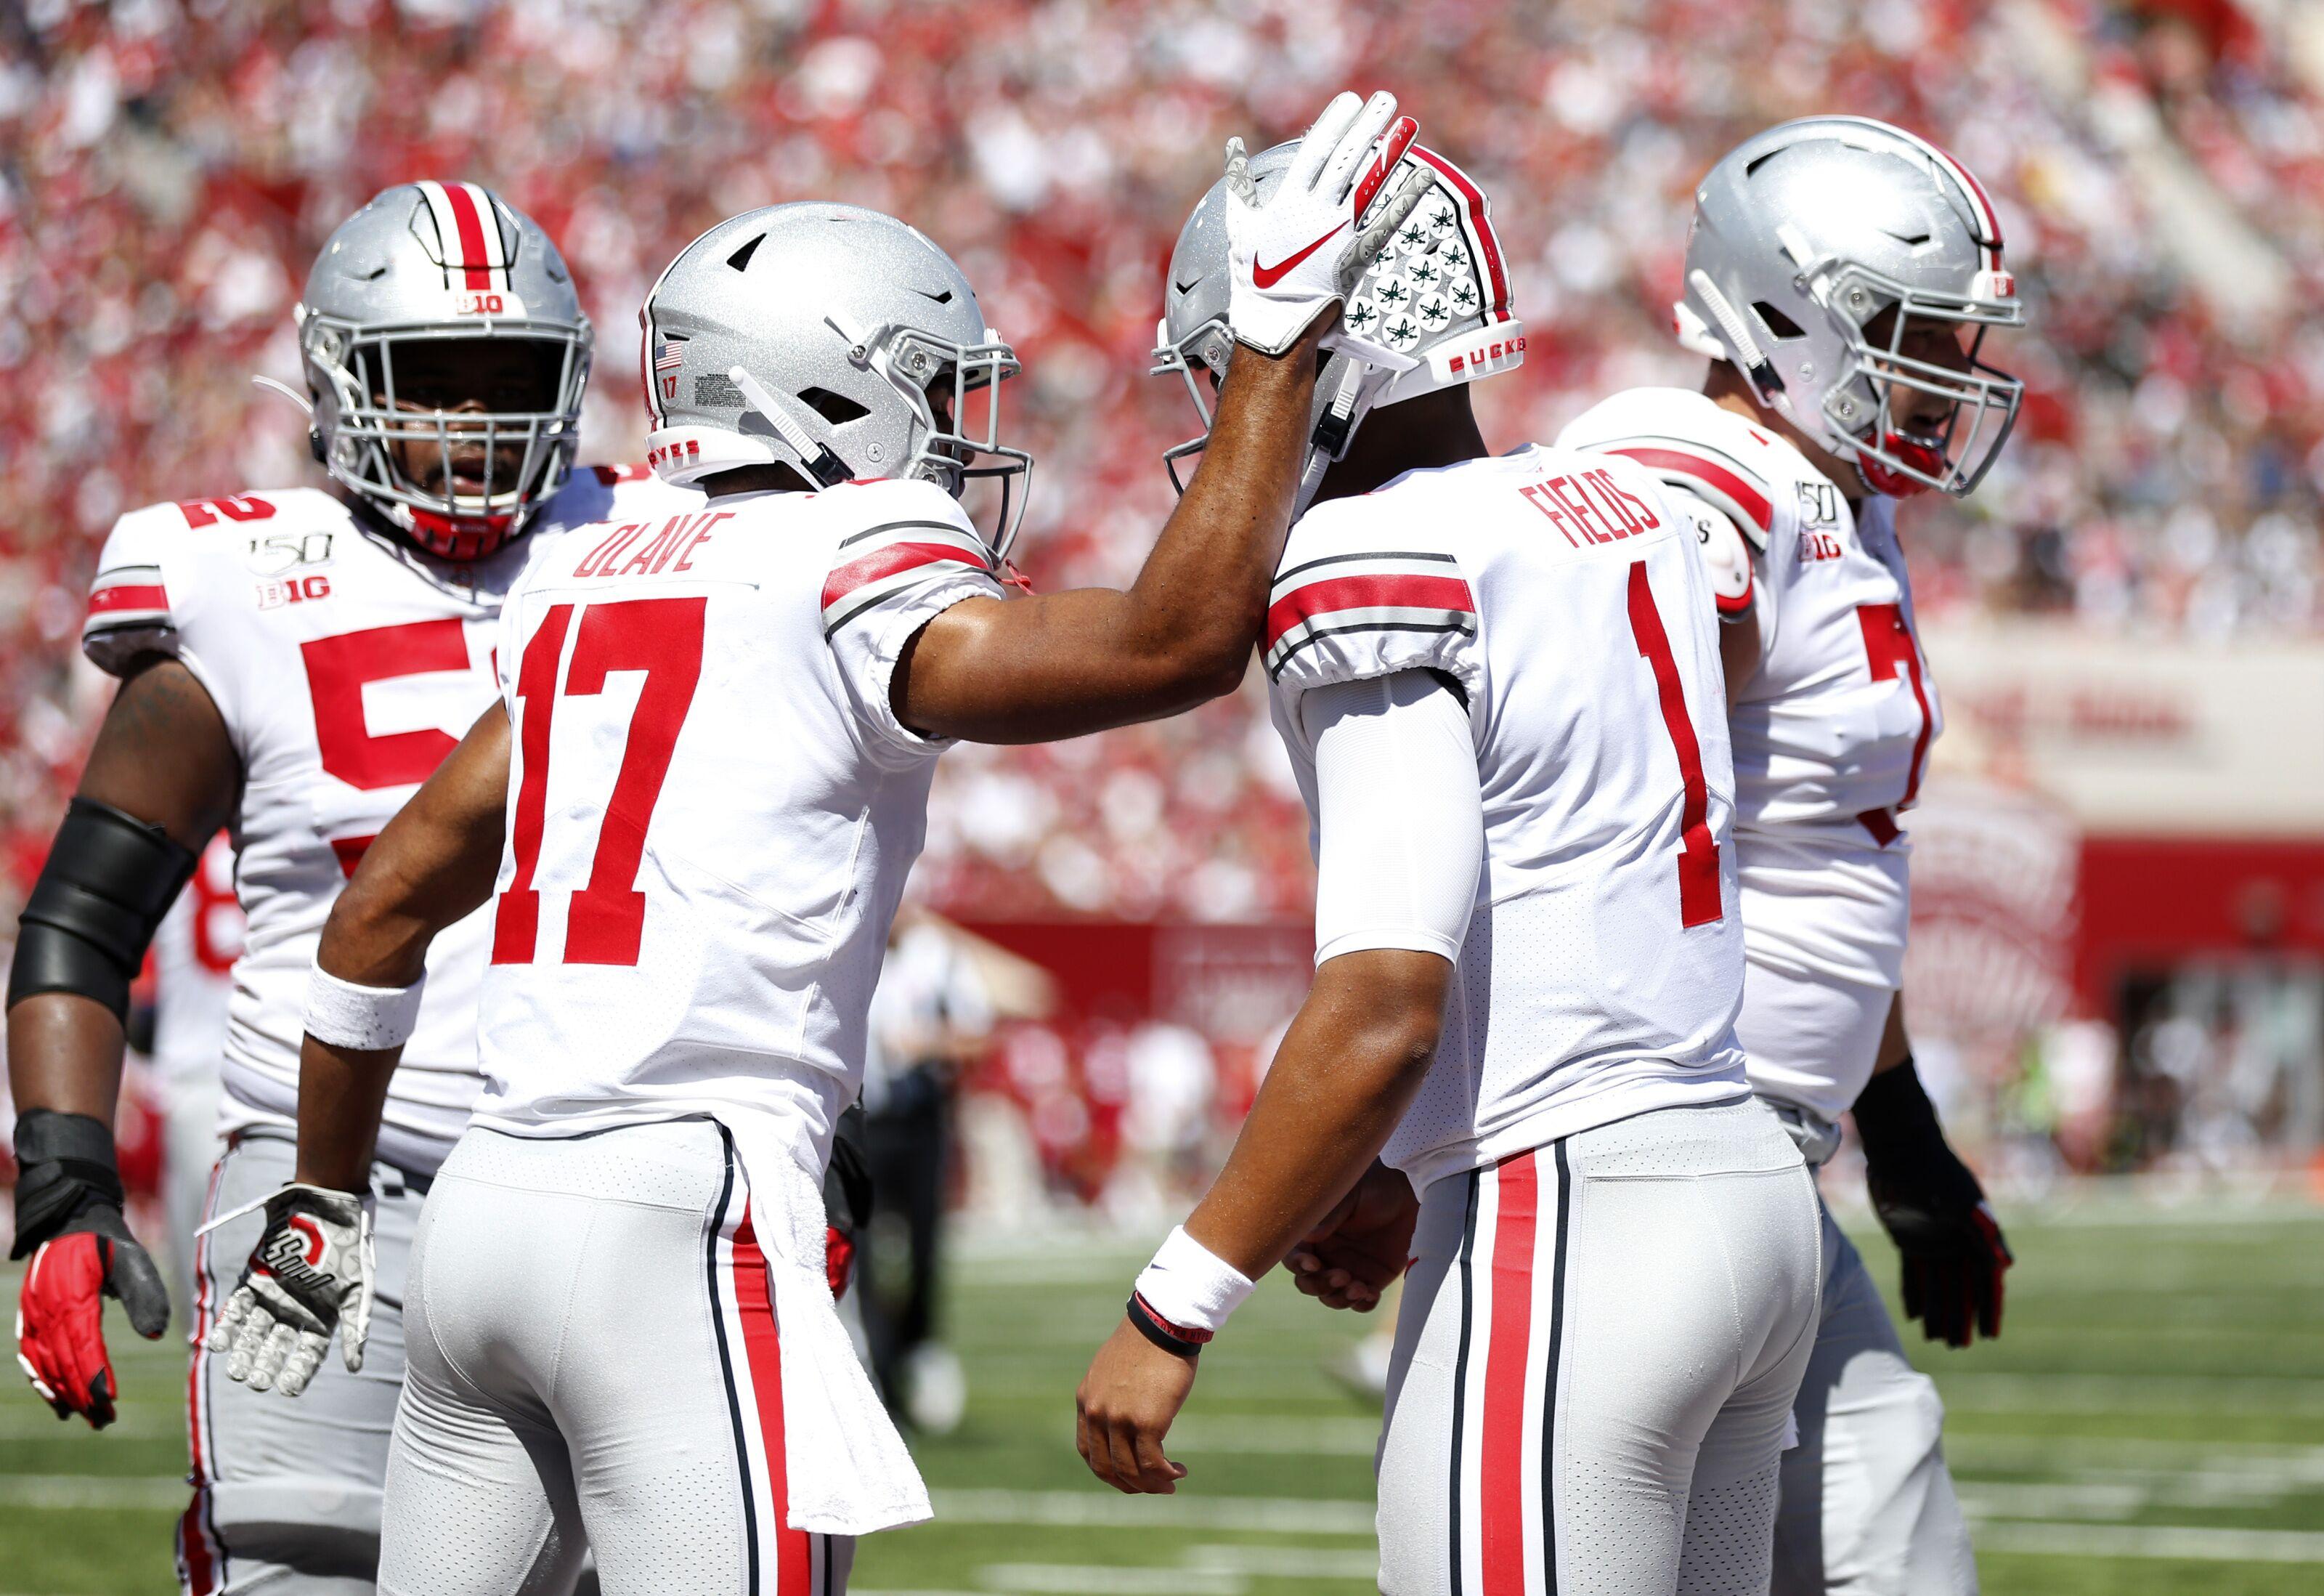 Ohio State football: Big Ten West Week 4 predictions